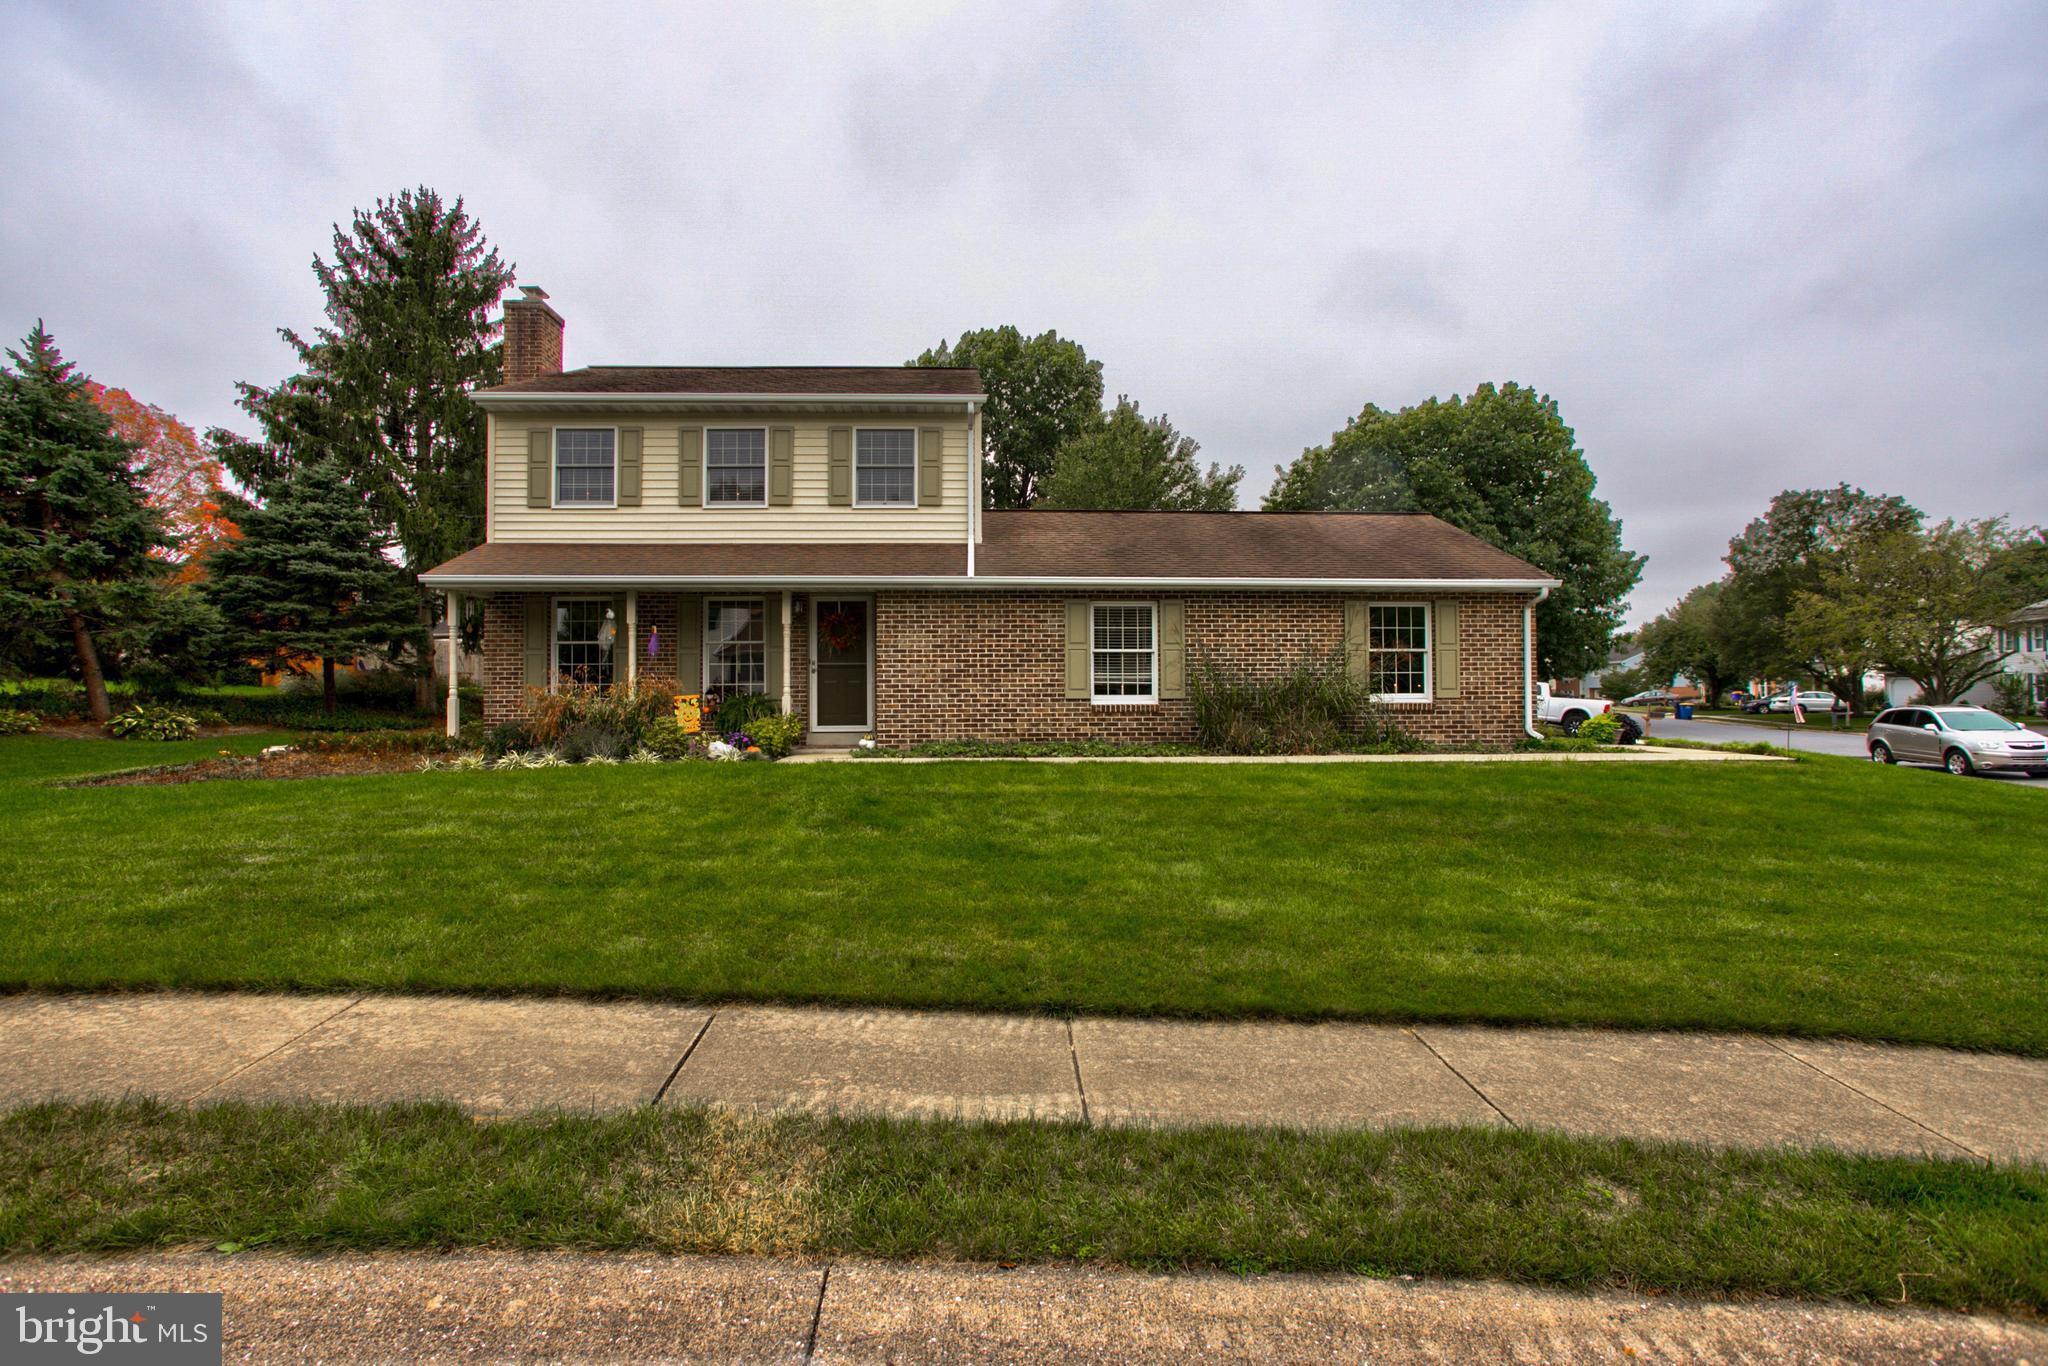 498 Salem Drive, Lancaster, PA 17601